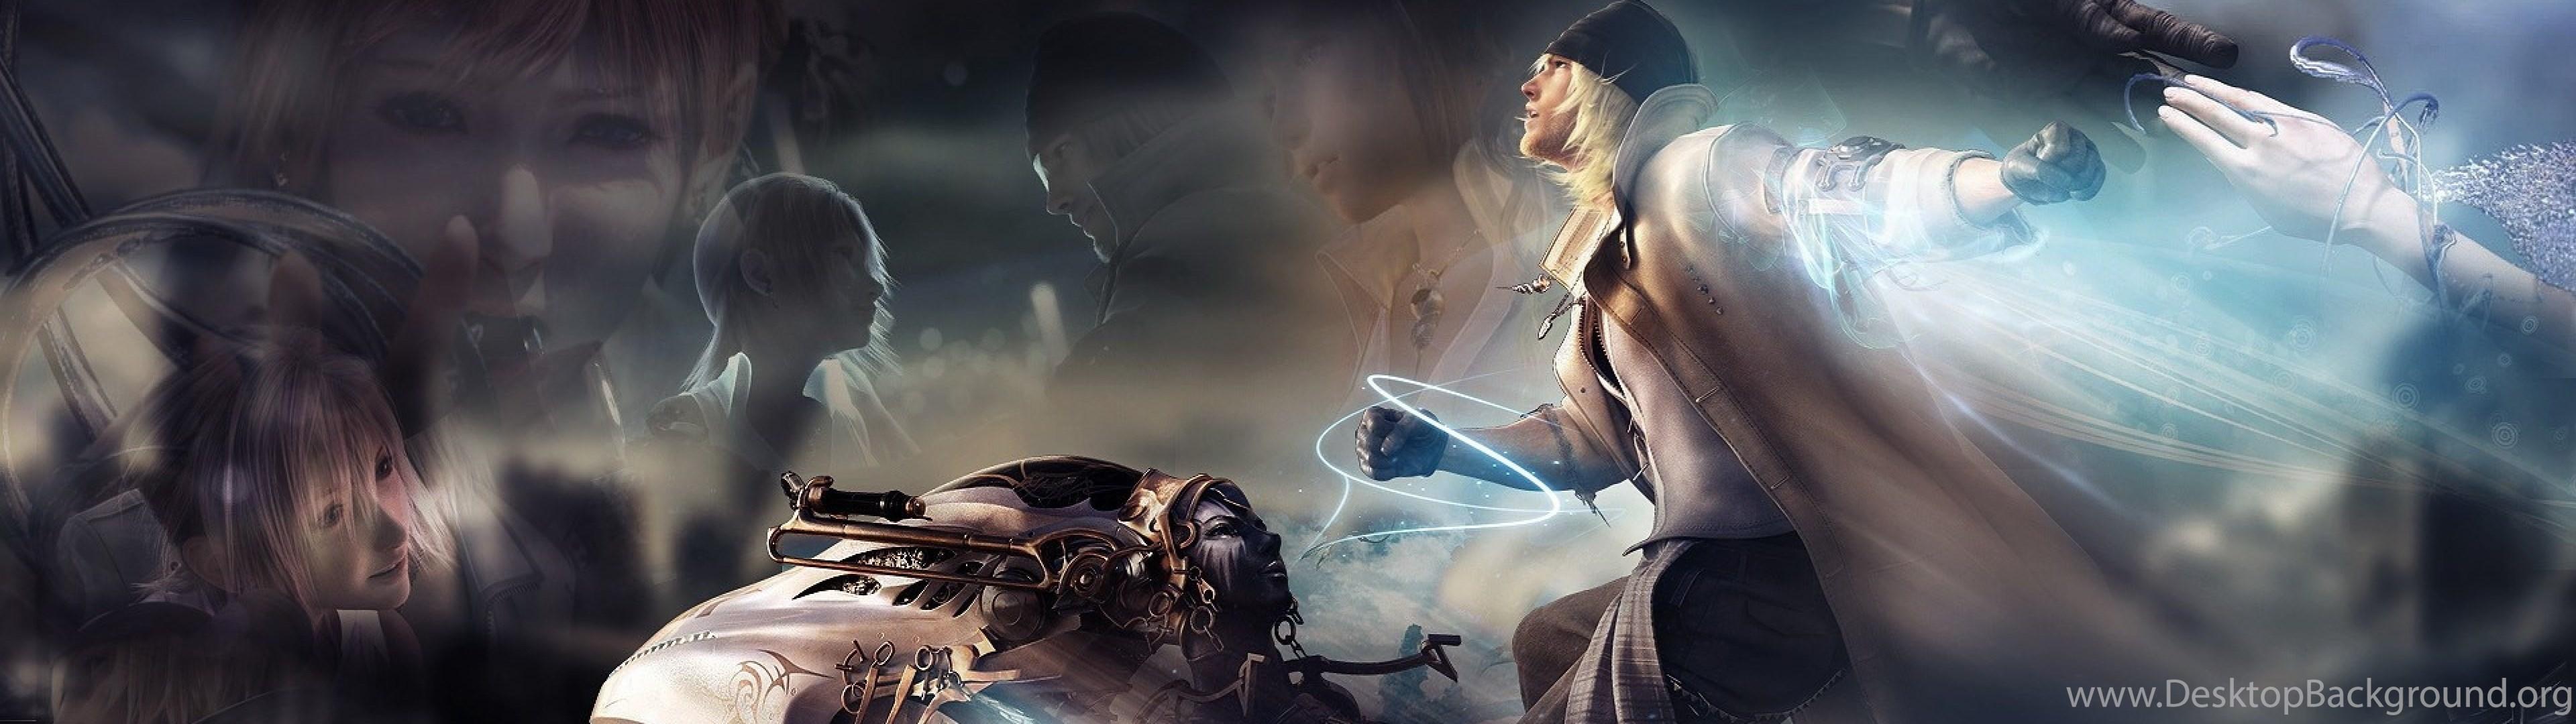 Dual Wide Final Fantasy Xiii Wallpapers Hd Desktop Backgrounds